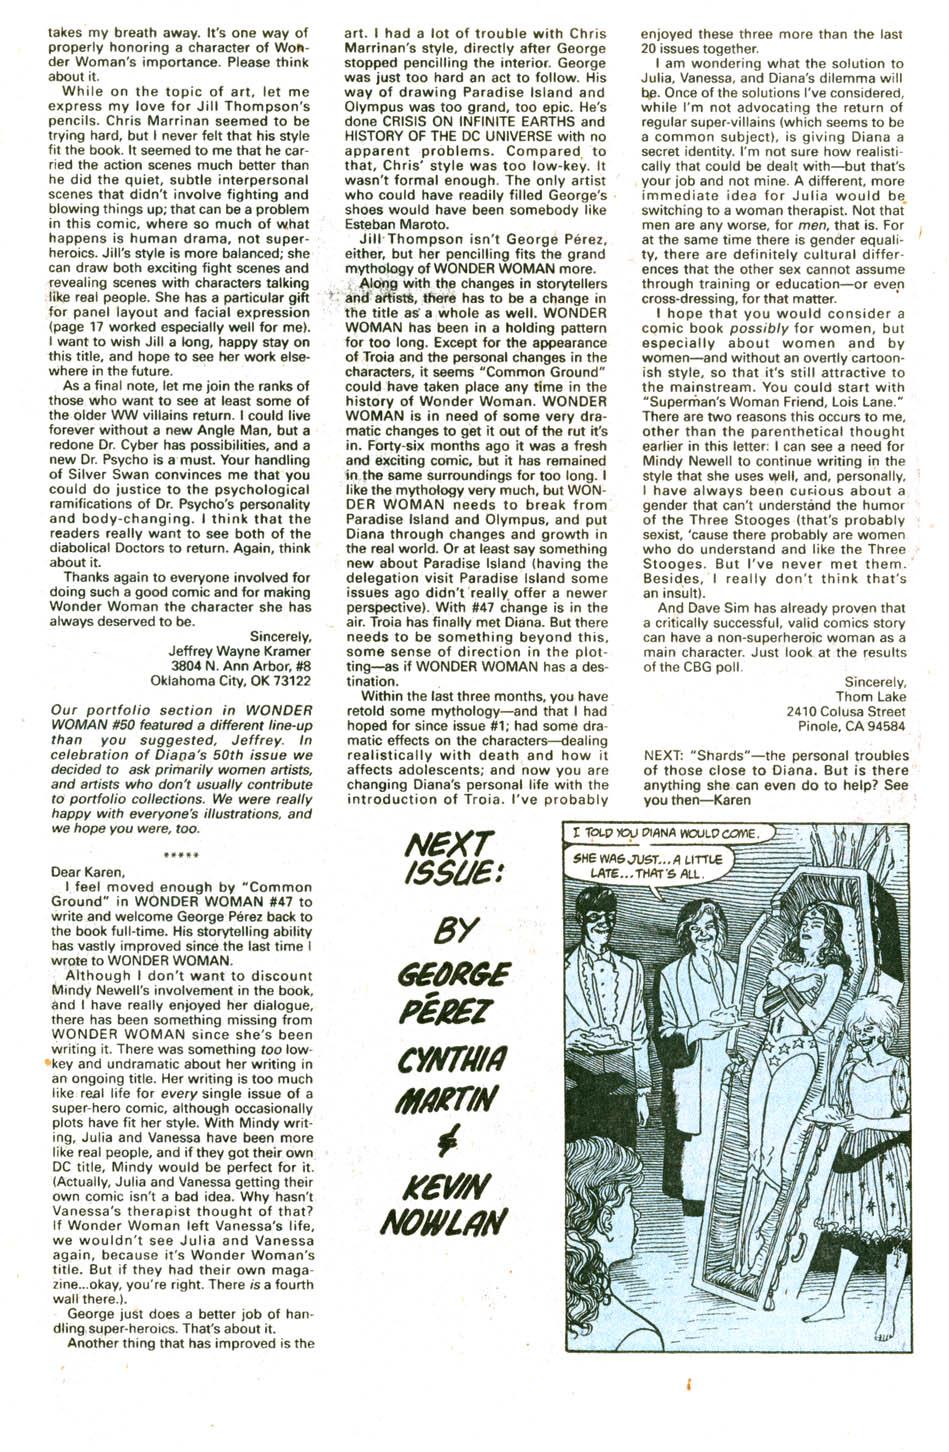 Read online Wonder Woman (1987) comic -  Issue #51 - 26